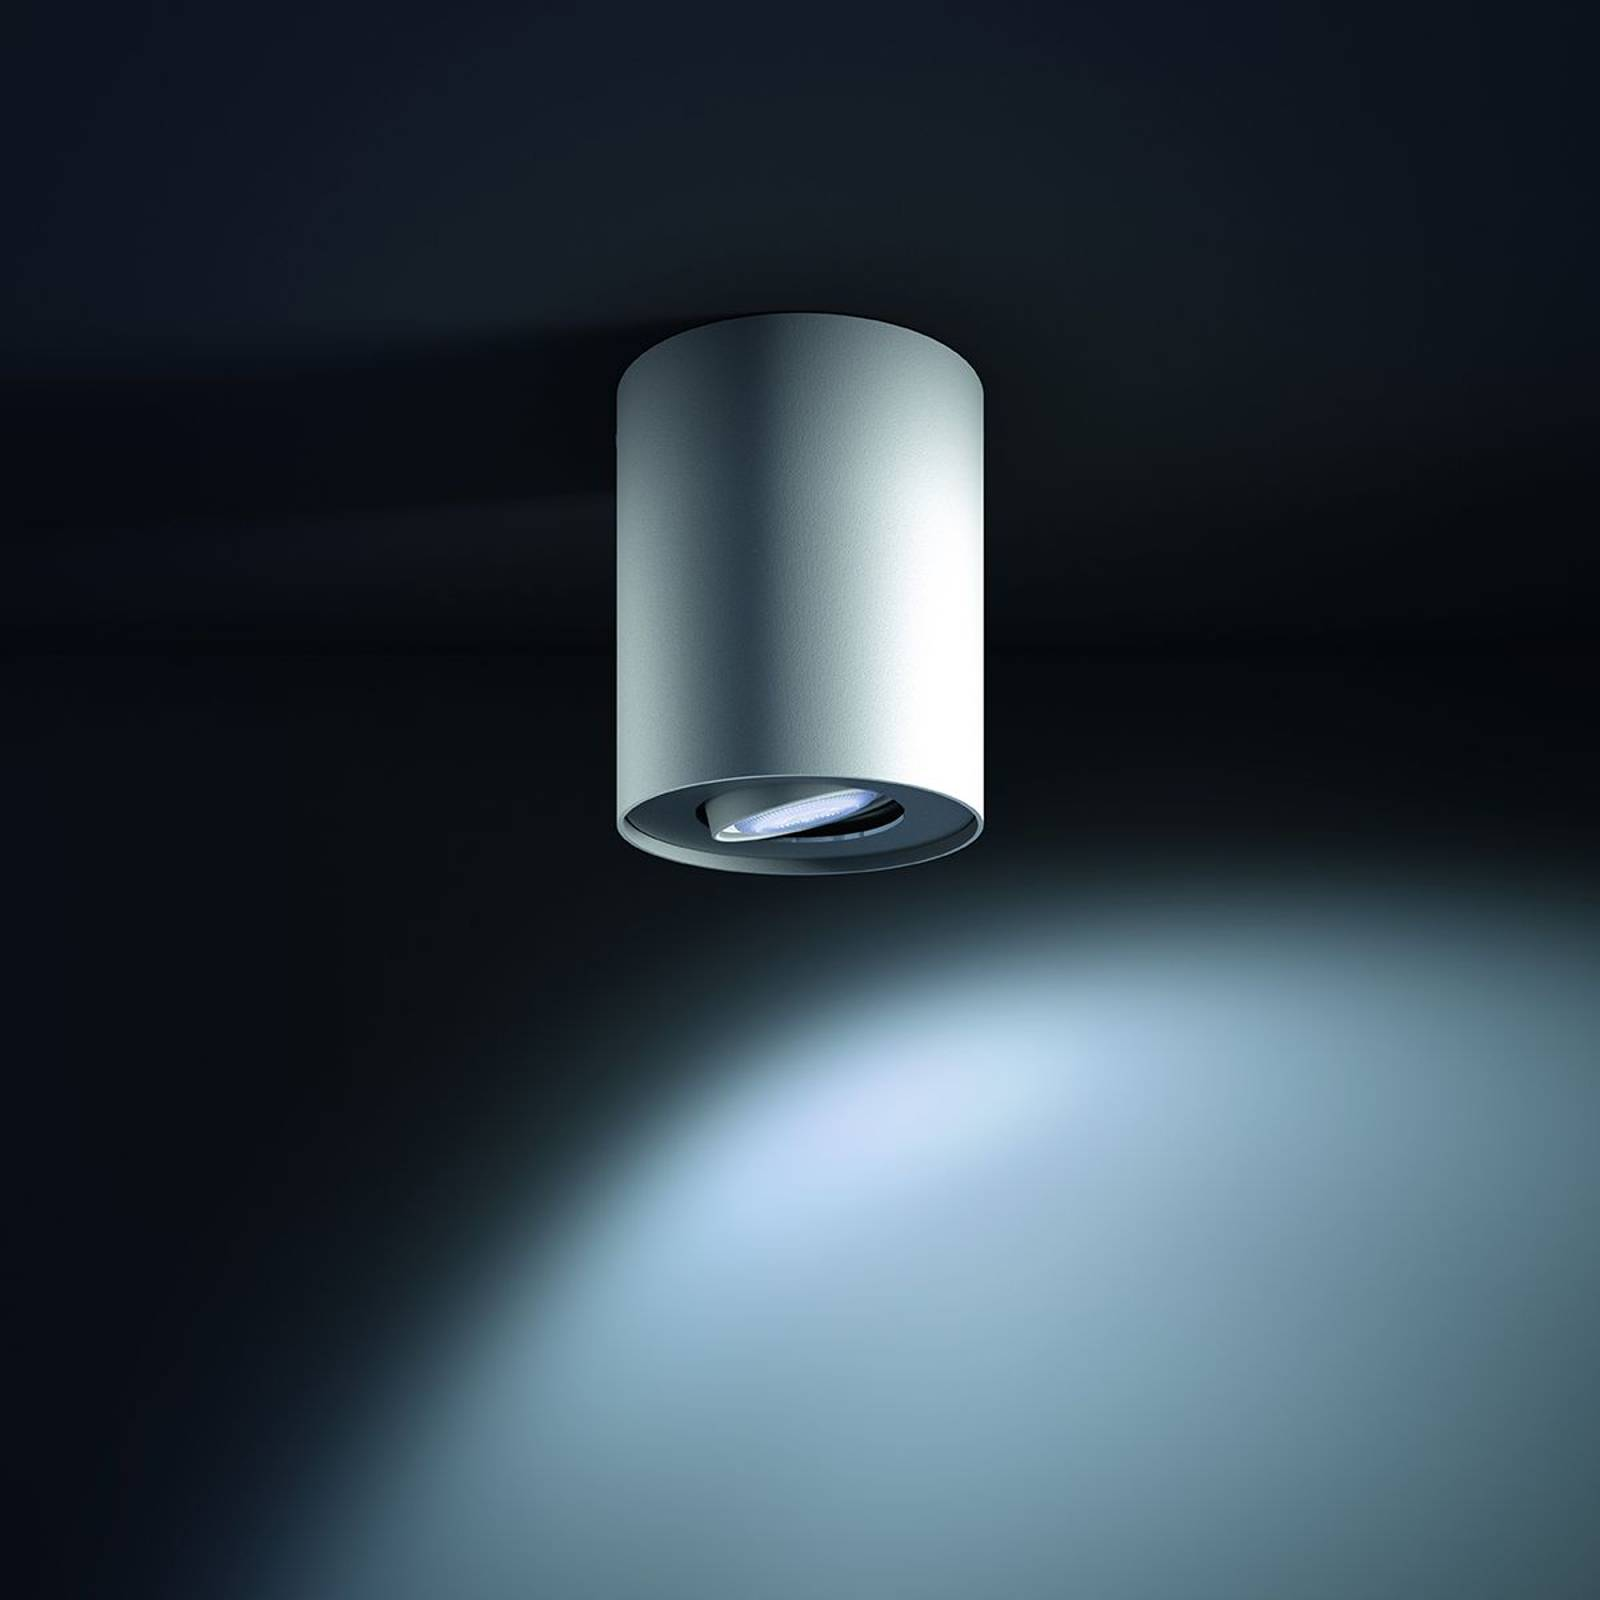 Philips Hue Pillar LED-spotti, himmennin